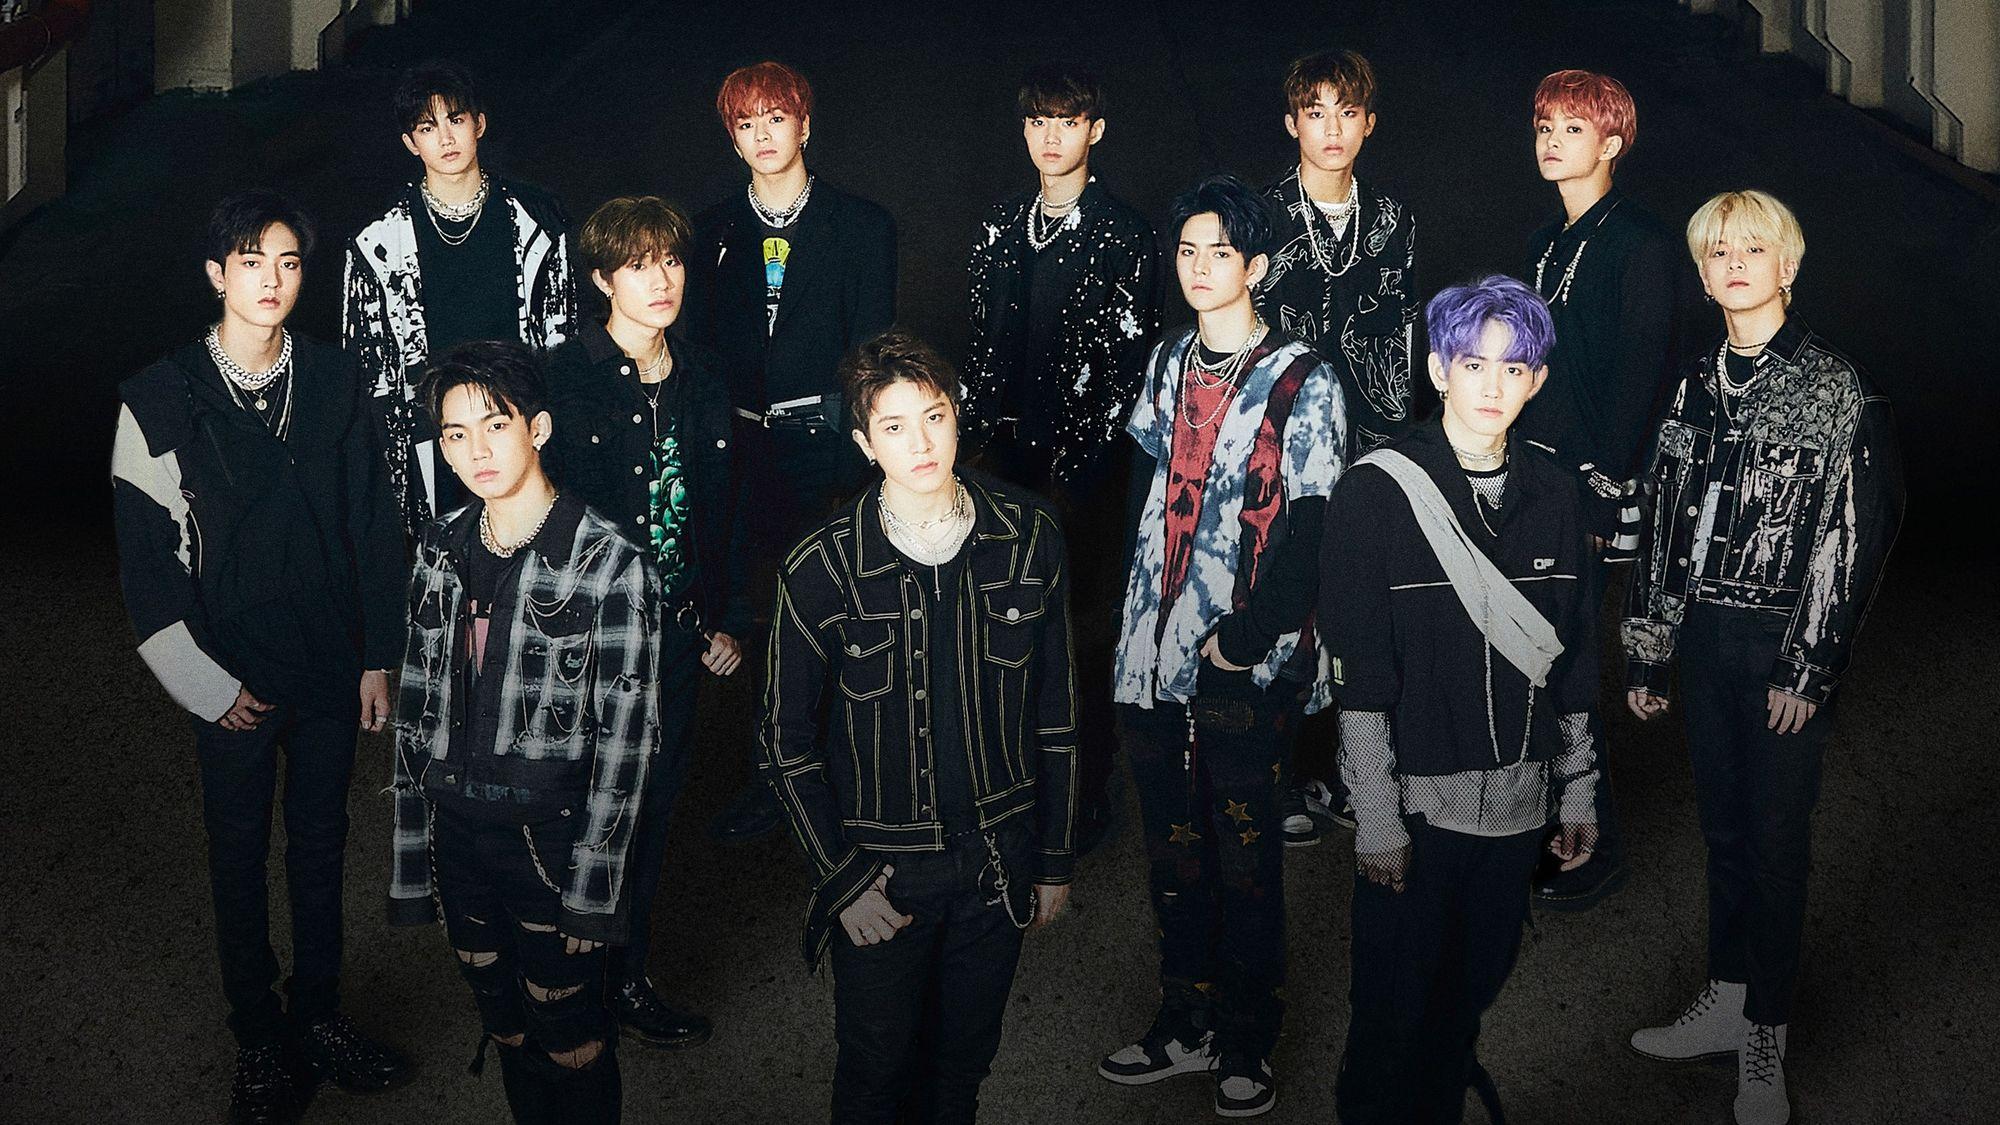 Top 10 Best Selling Kpop Boy Groups Of 2021 So Far